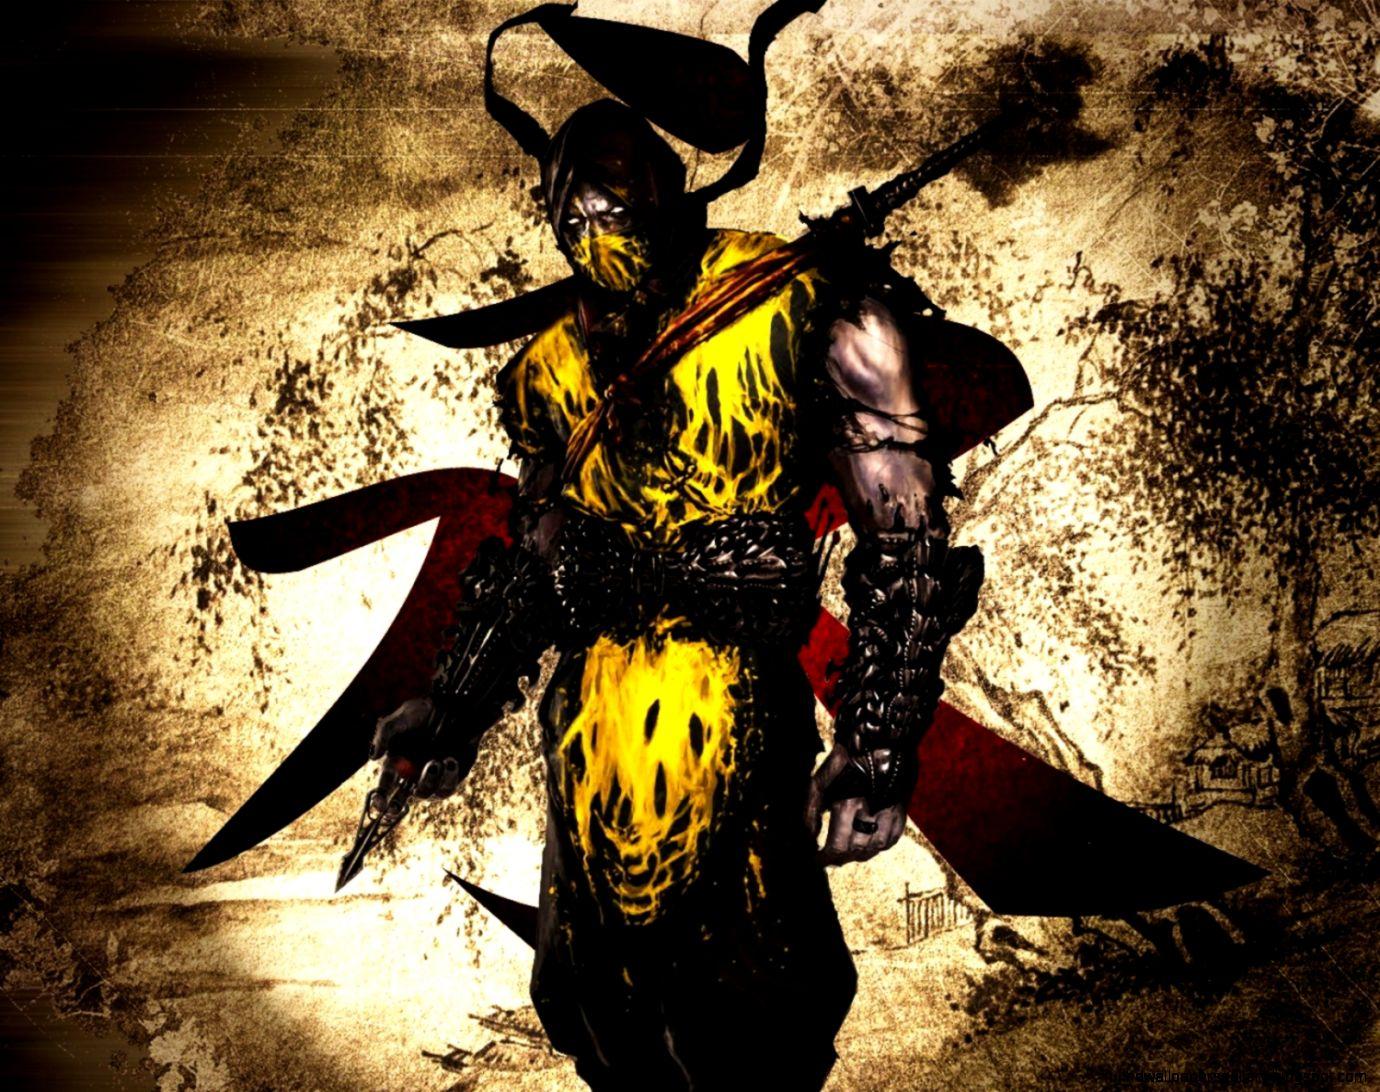 Mortal Kombat Scorpion Wallpapers | Full HD Wallpapers